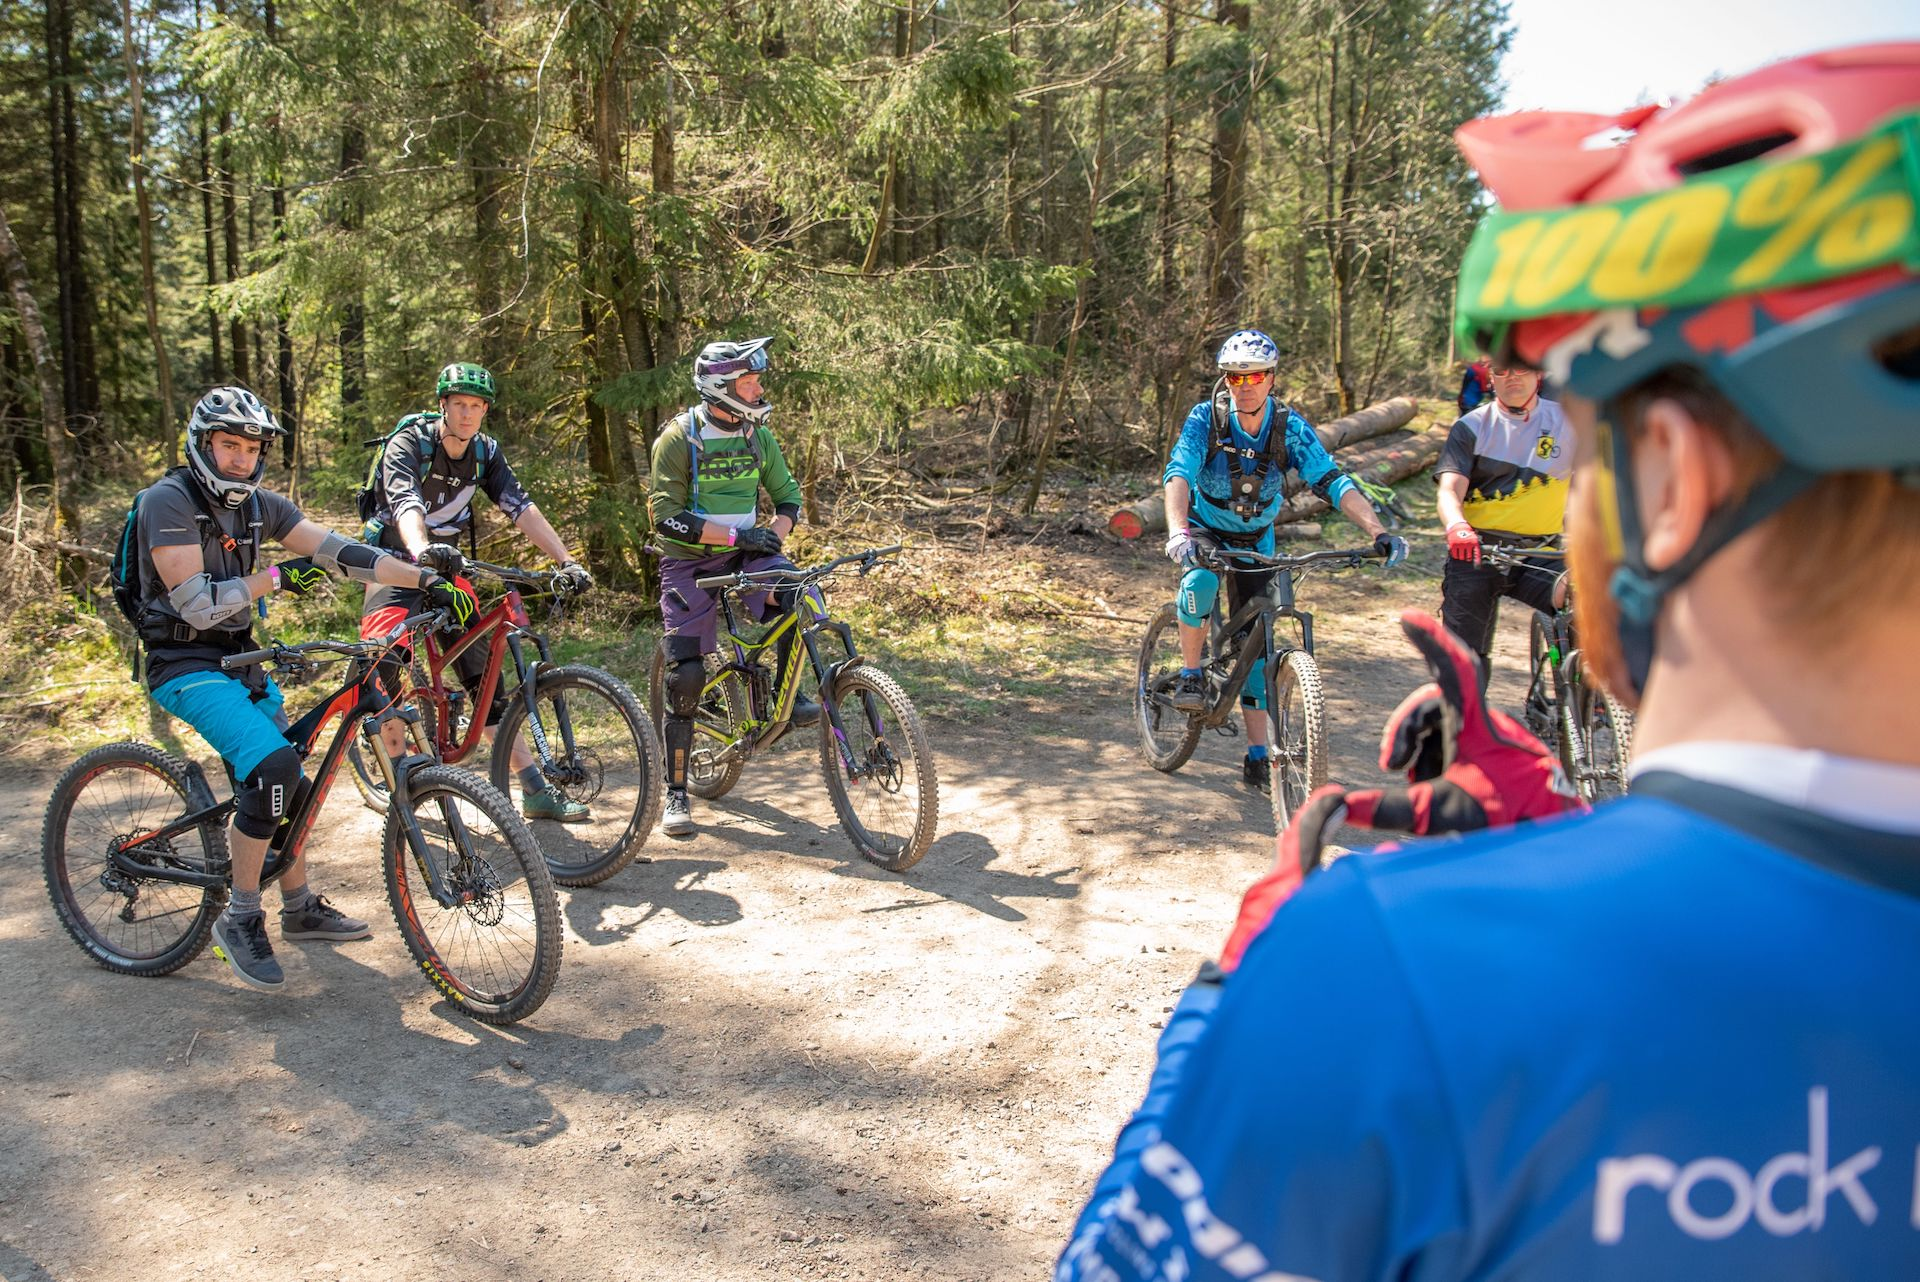 MTB Fahrtechnik Kurse in Saarbrücken Training Einsteiger Fortgeschritten Experten Kinder Rock my Trail Bikeschule